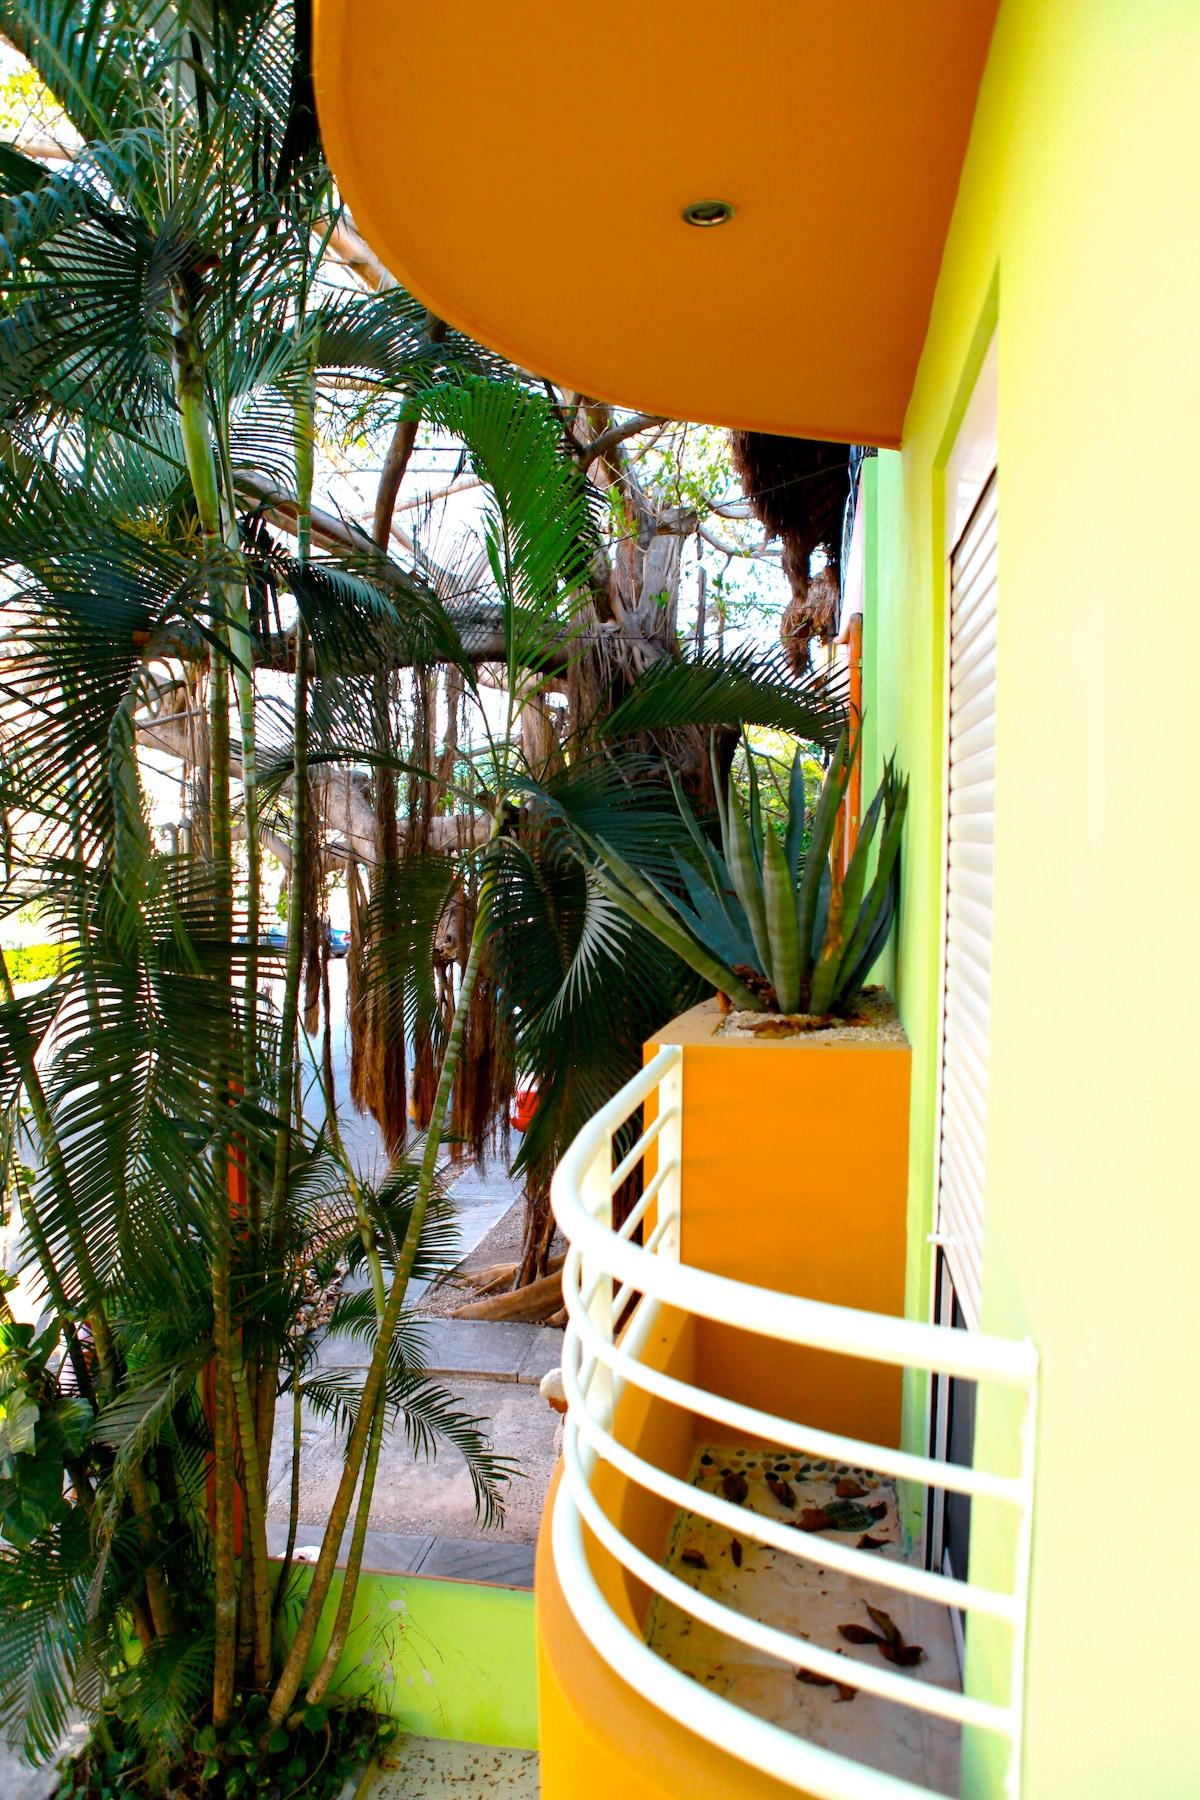 Nature surrounding bedroom balcony